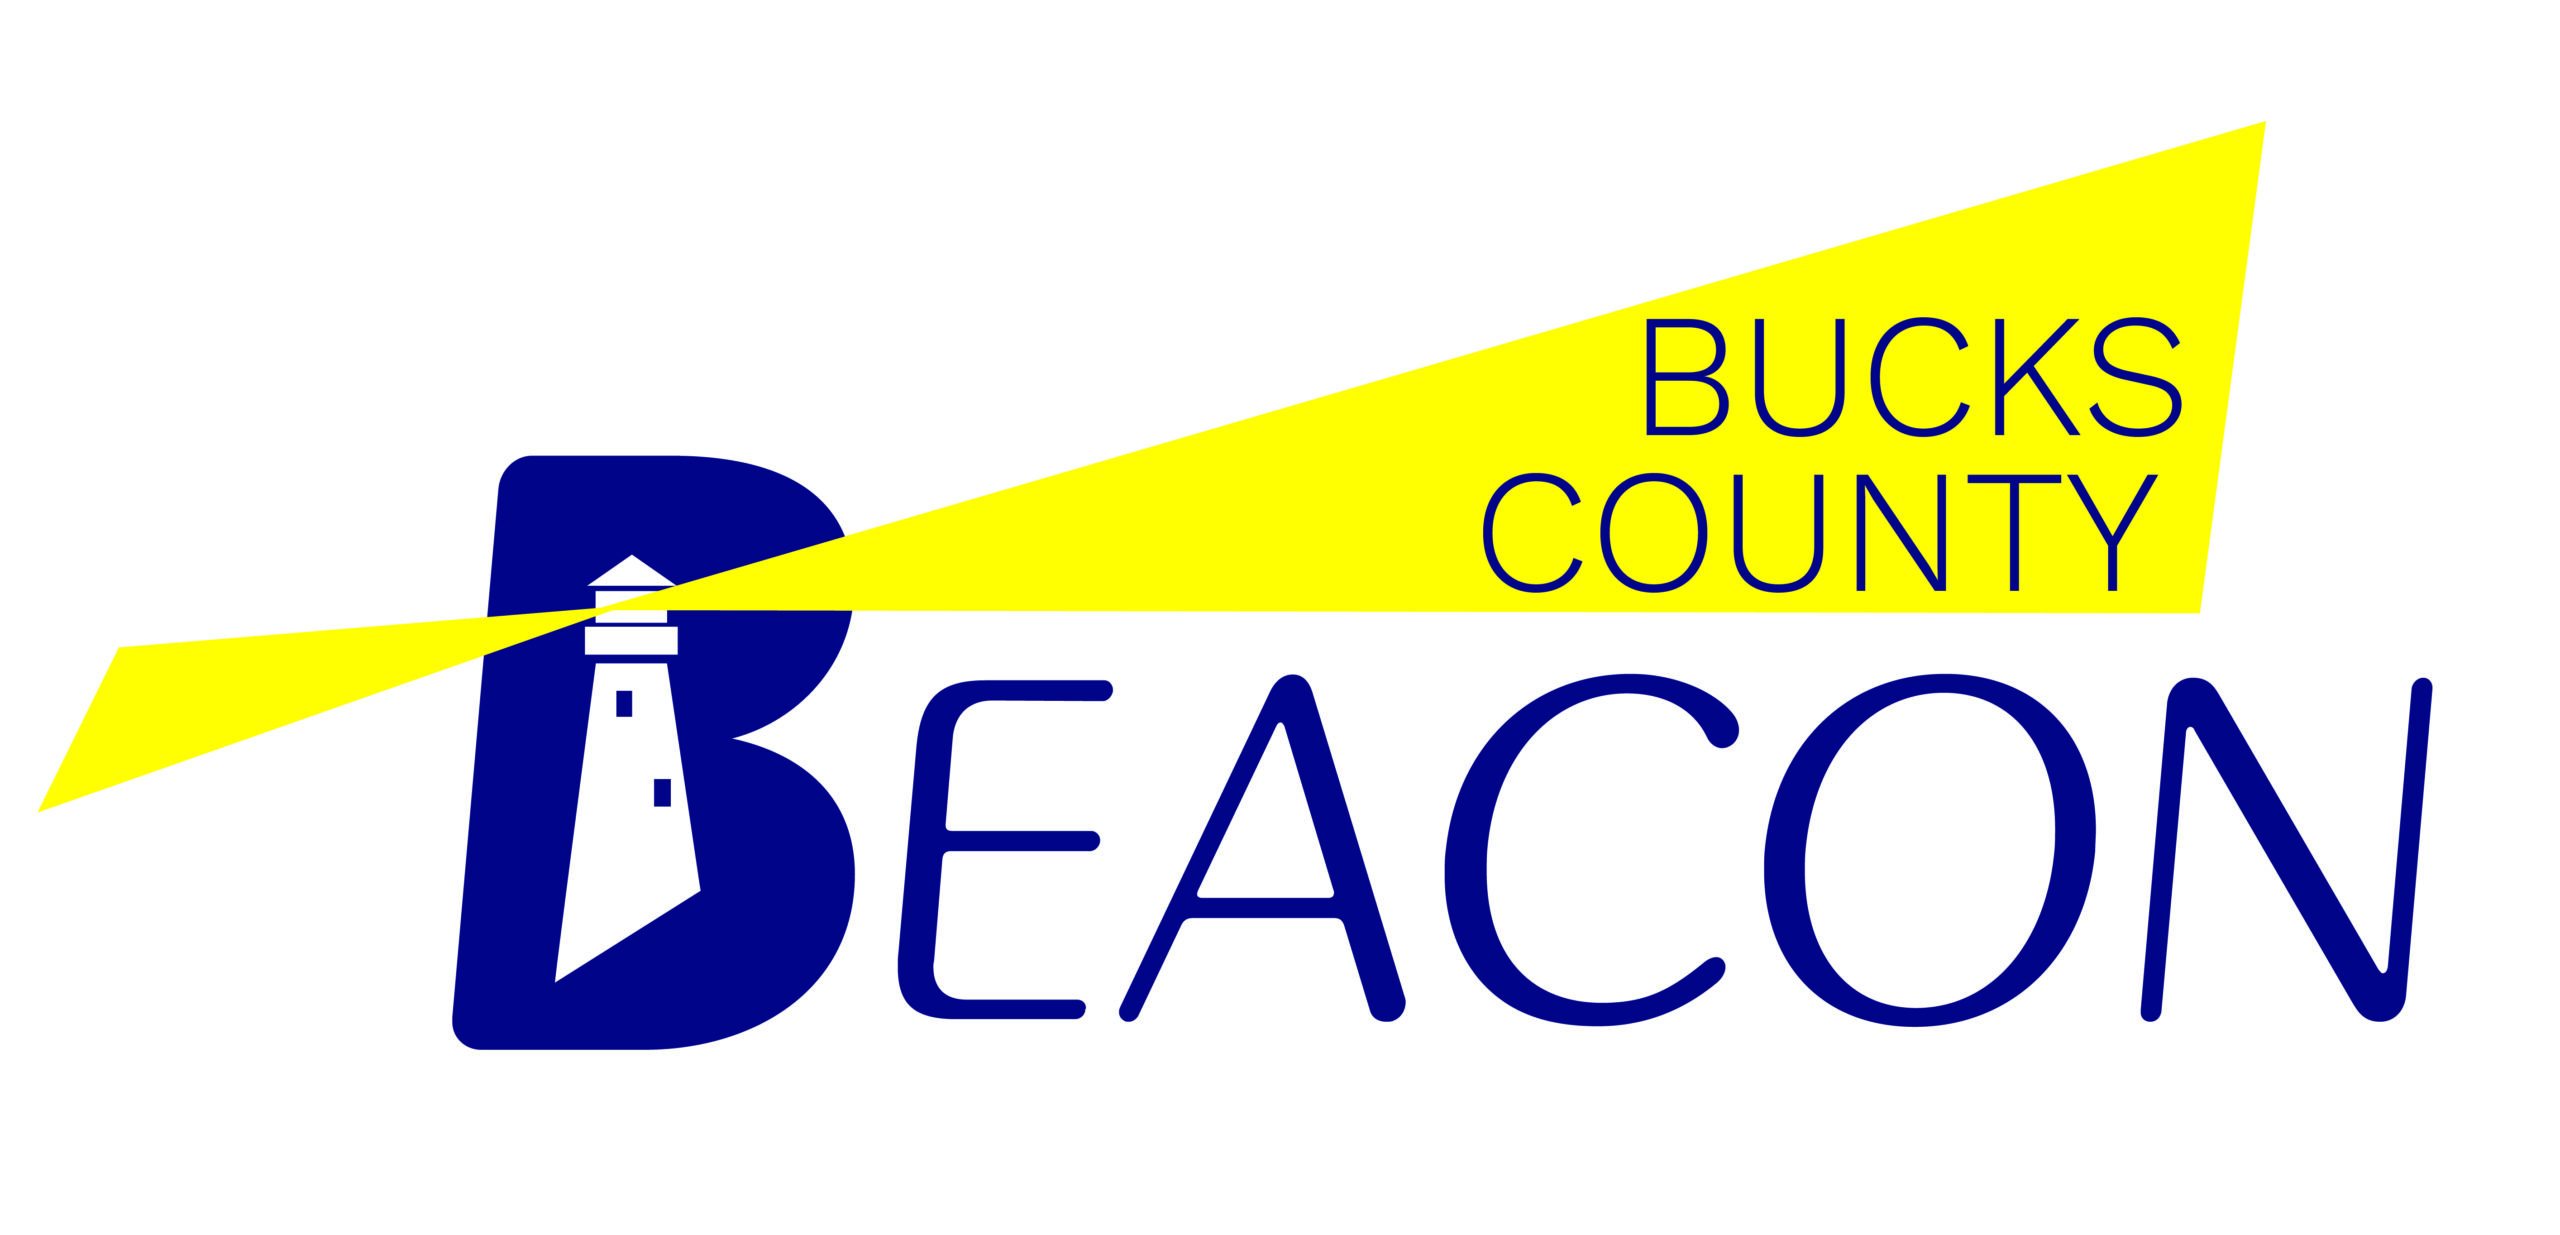 bucks county beacon news, government and politics